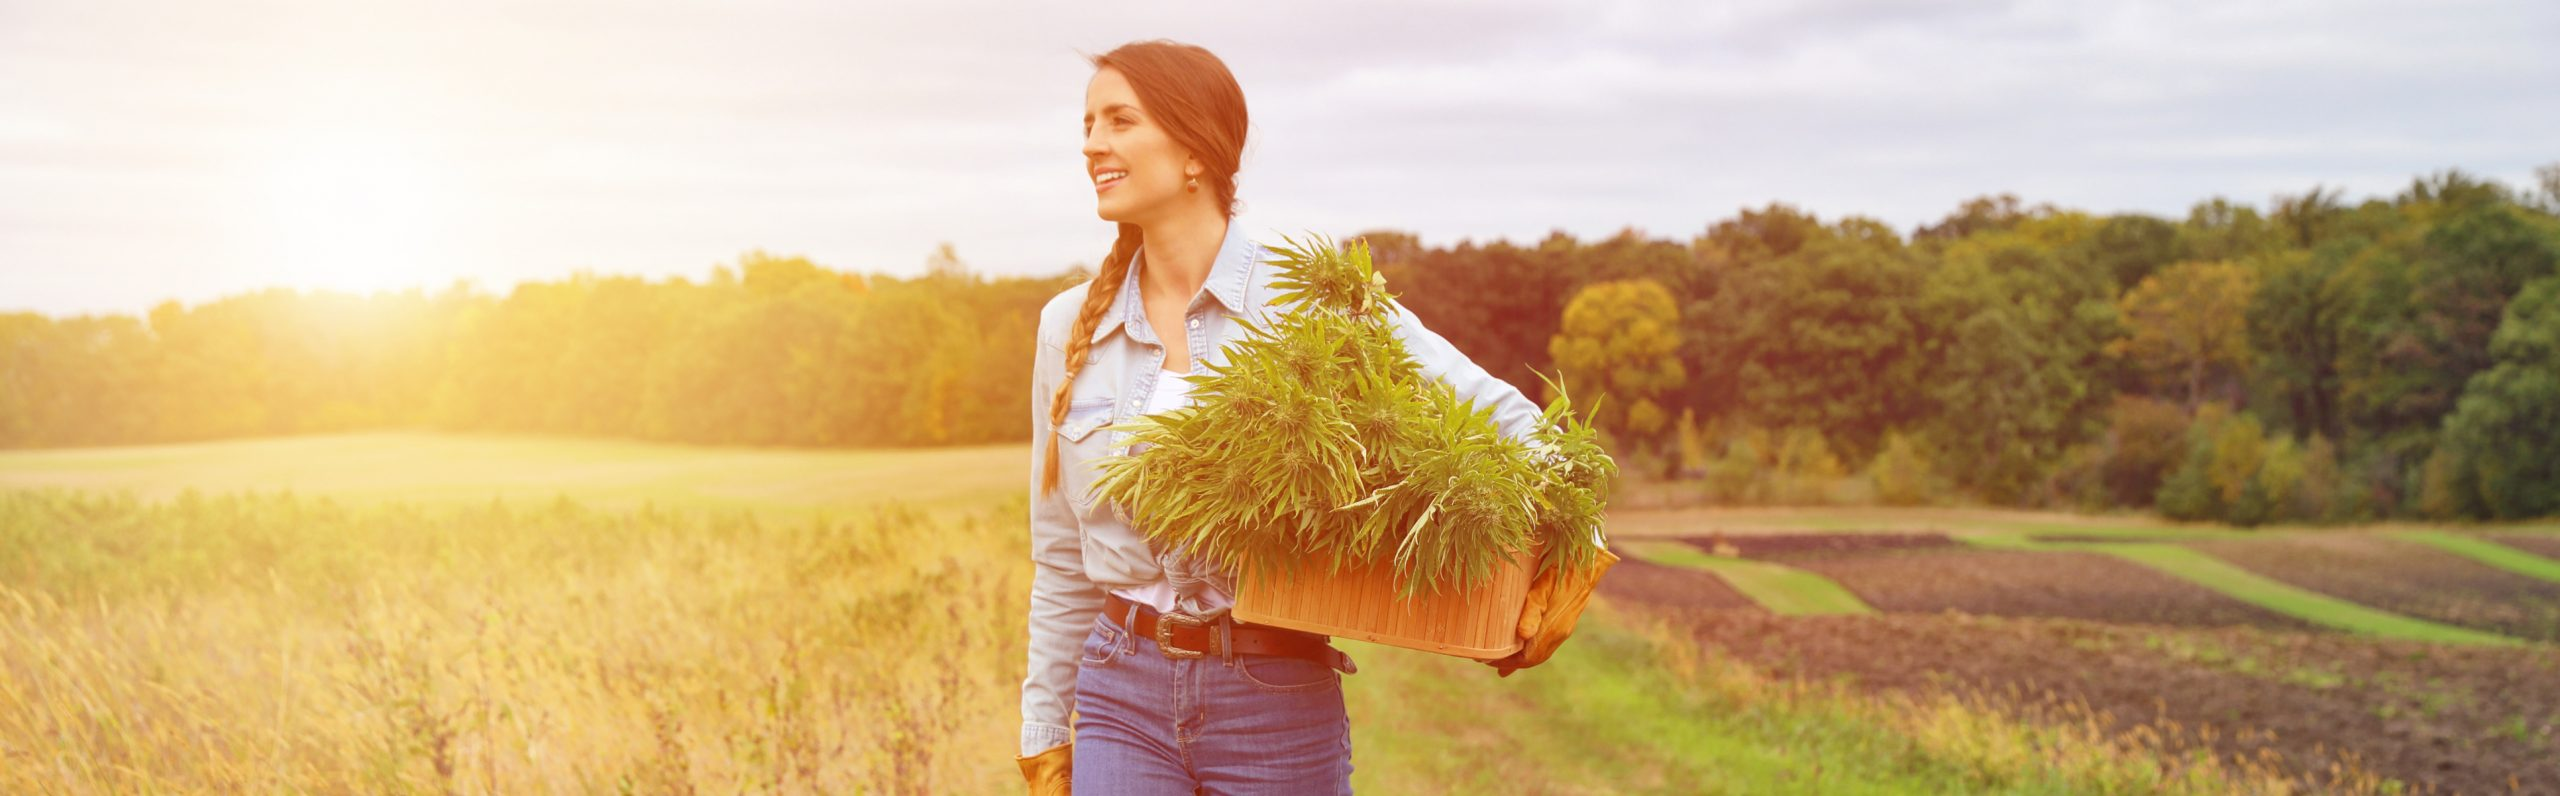 Cannabis Farmer Outdoor